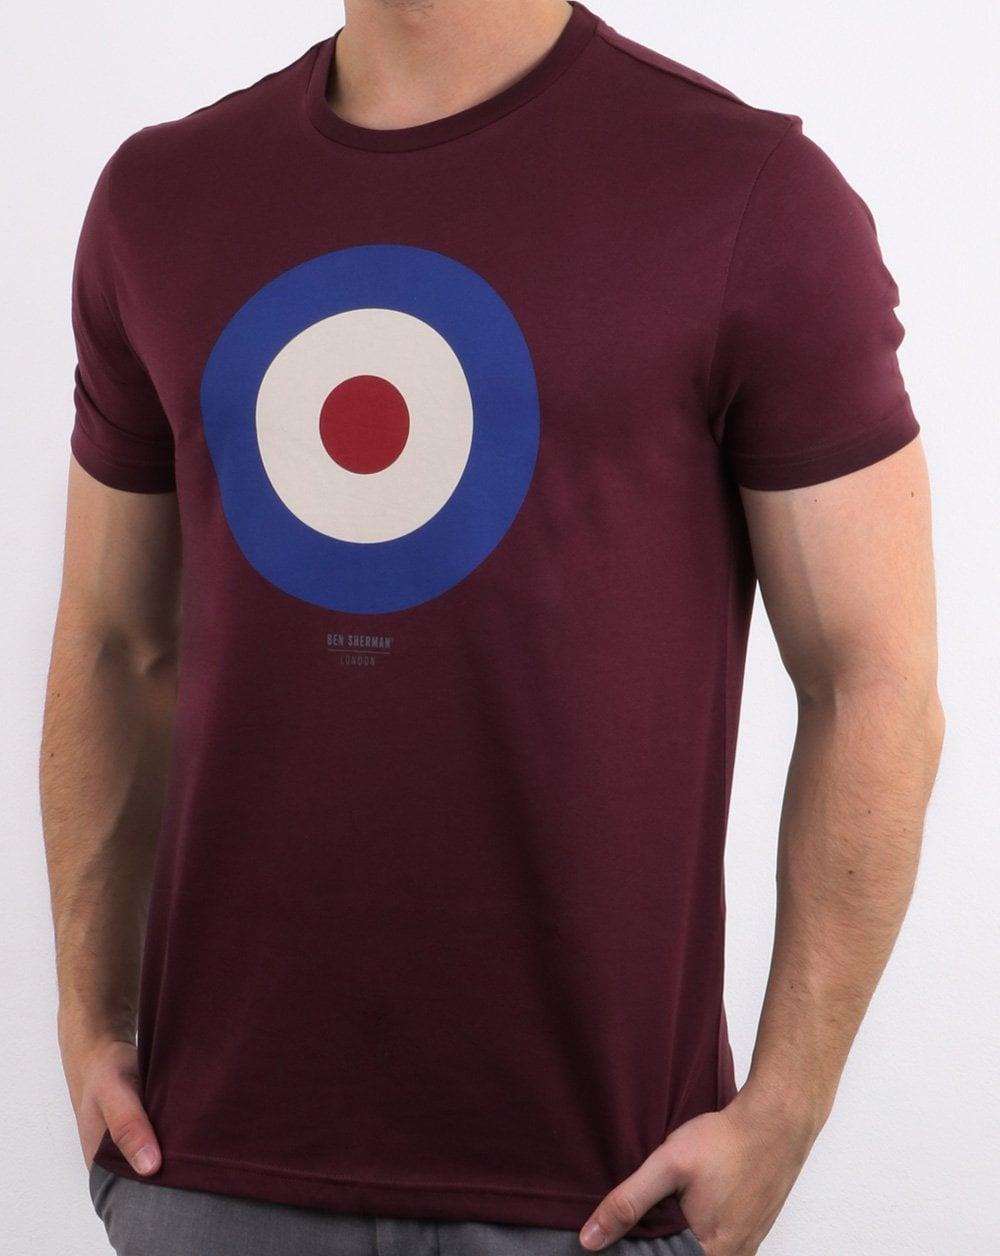 Decir a un lado Petición Aproximación  Ben Sherman Target T Shirt in Burgundy | 80s casual classics